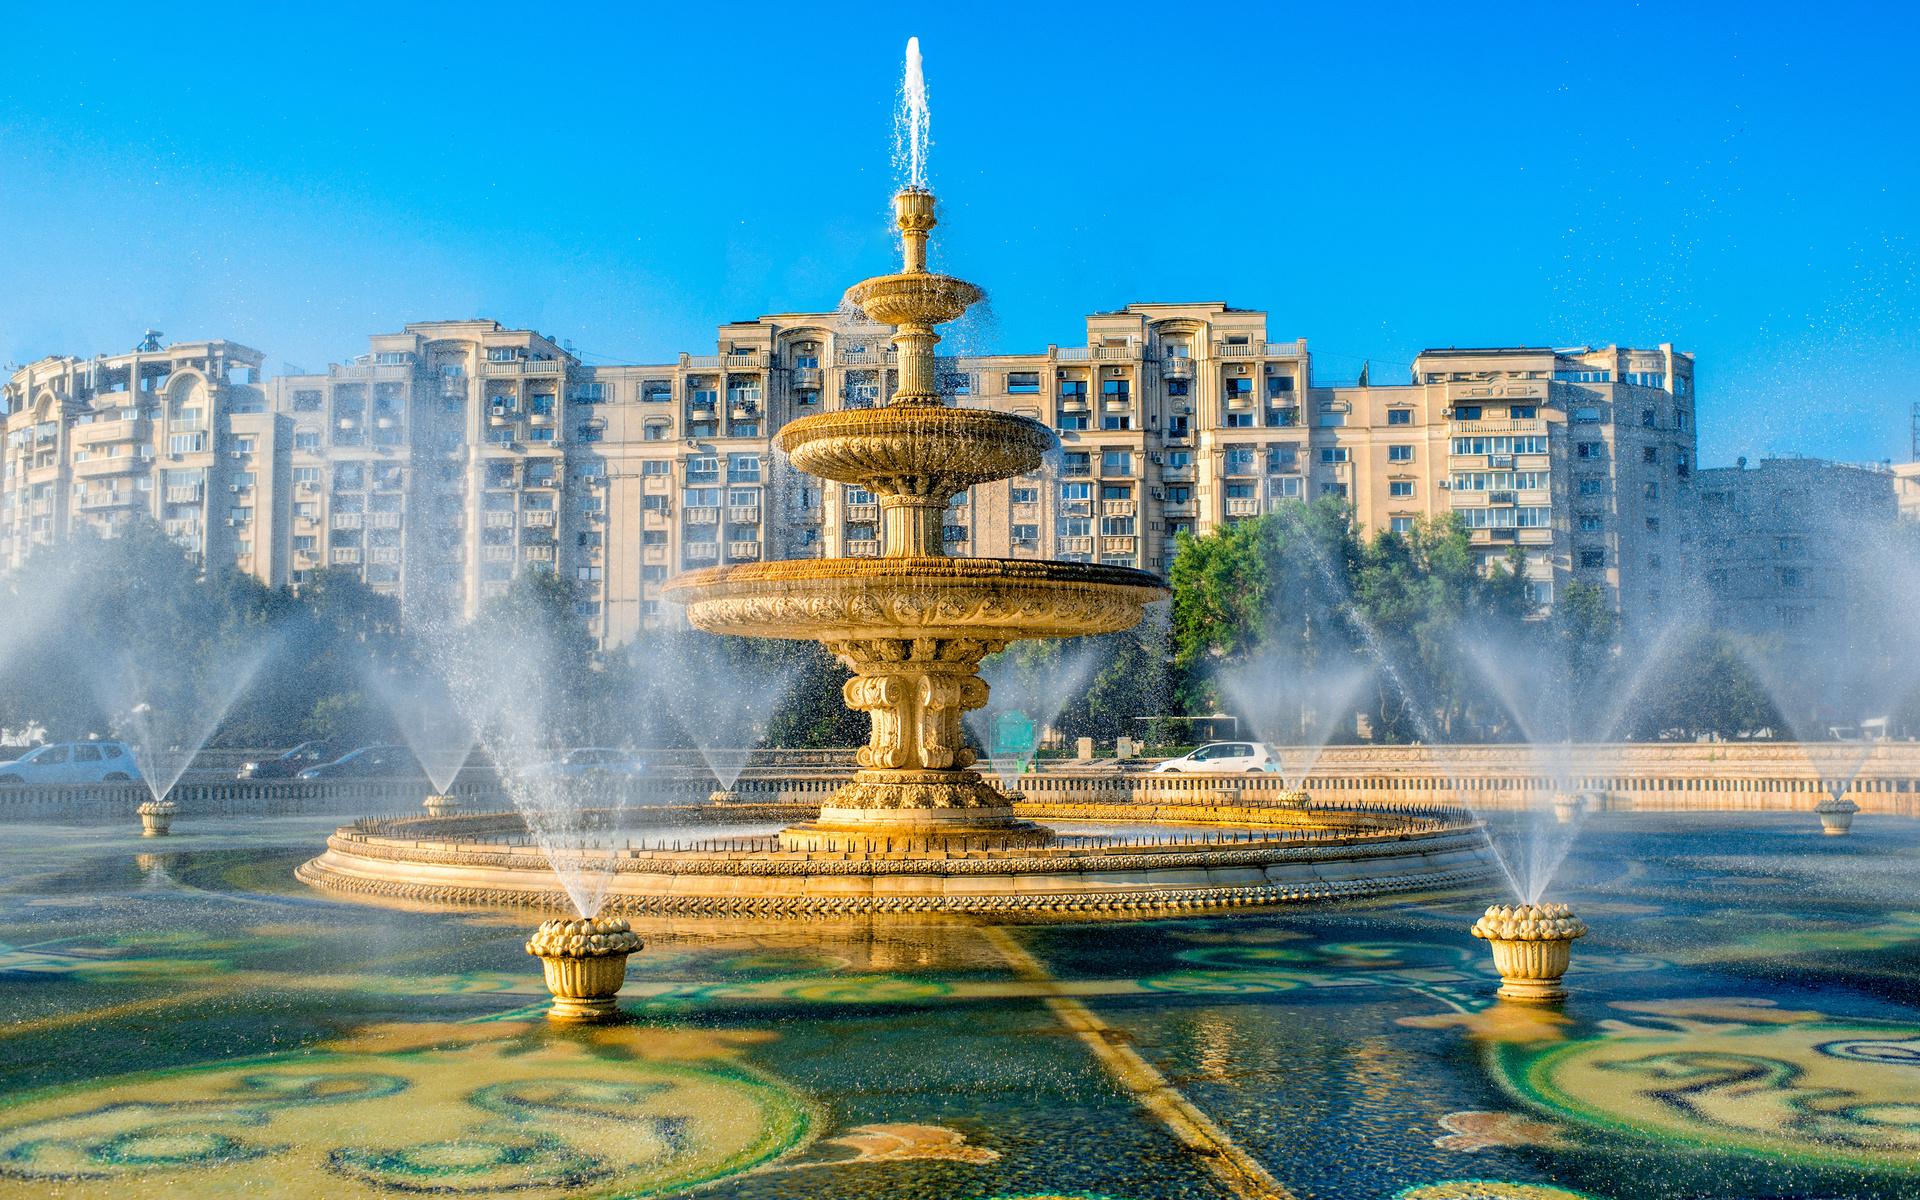 румыния, будапешт, дома, фонтан, брызги, город